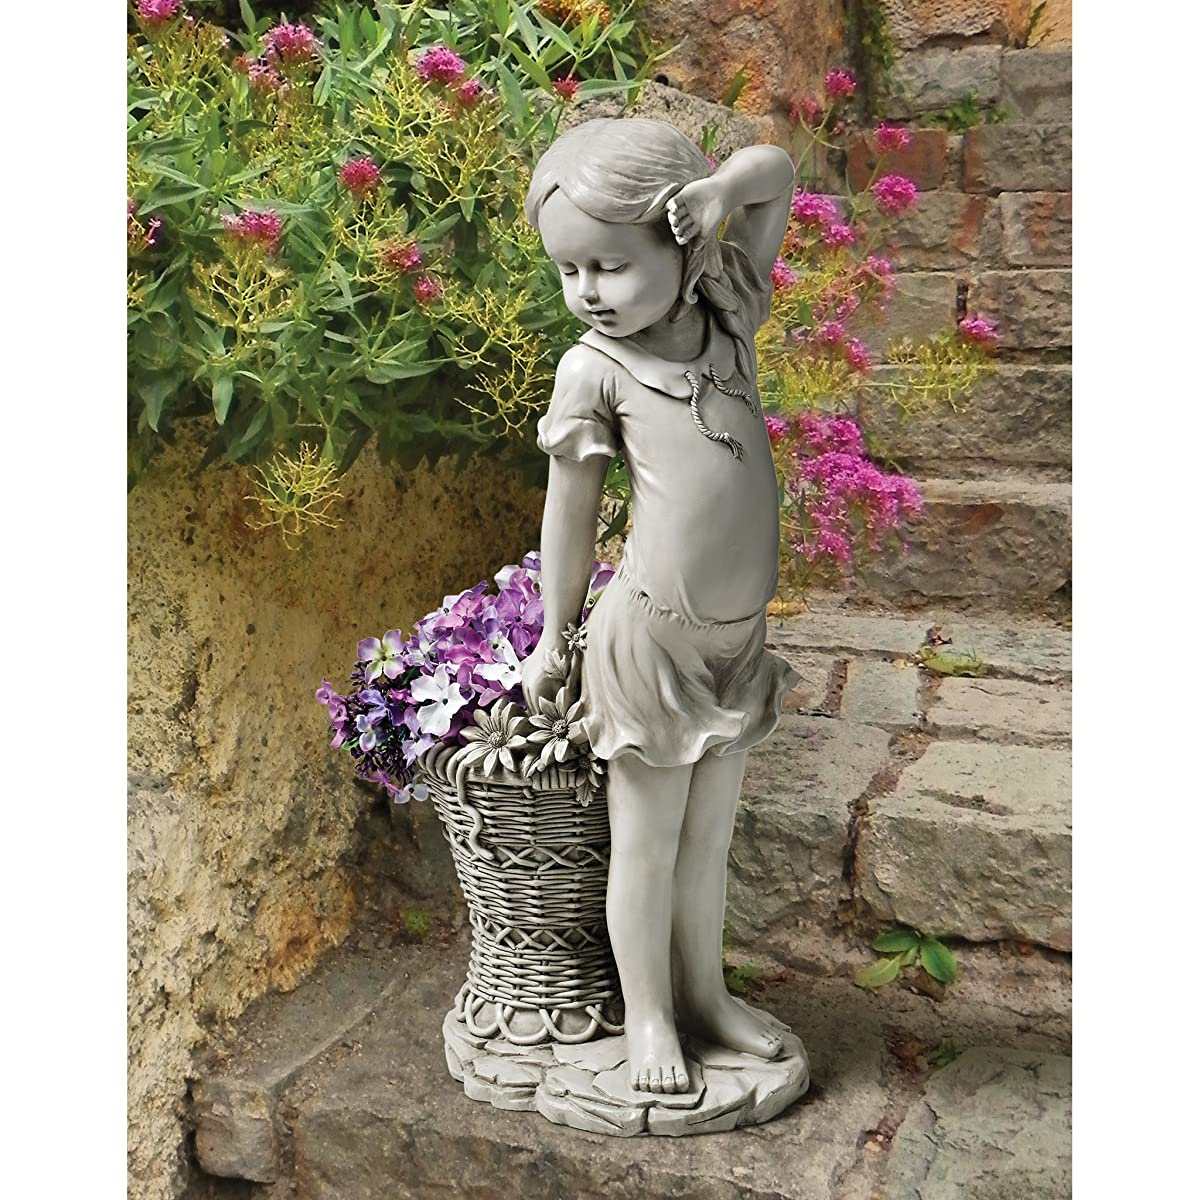 Design Toscano EU9294 Frances The Flower Girl Outdoor Garden Statue with Planter, 21 Inch, Antique Stone